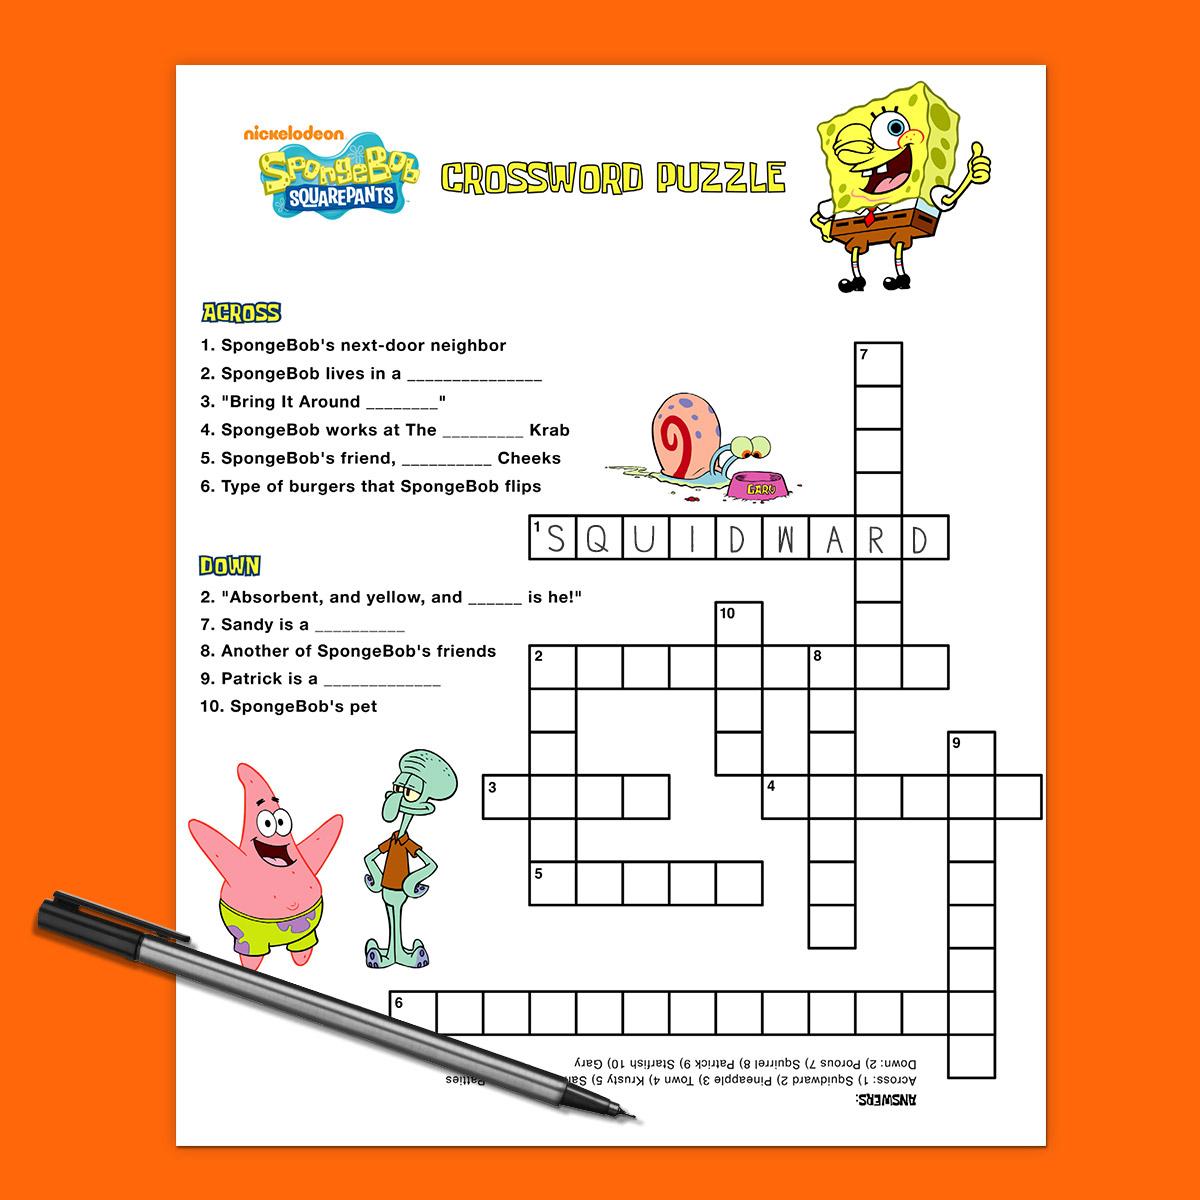 Spongebob Crossword Puzzle | Nickelodeon Parents - Birthday Crossword Puzzle Printable